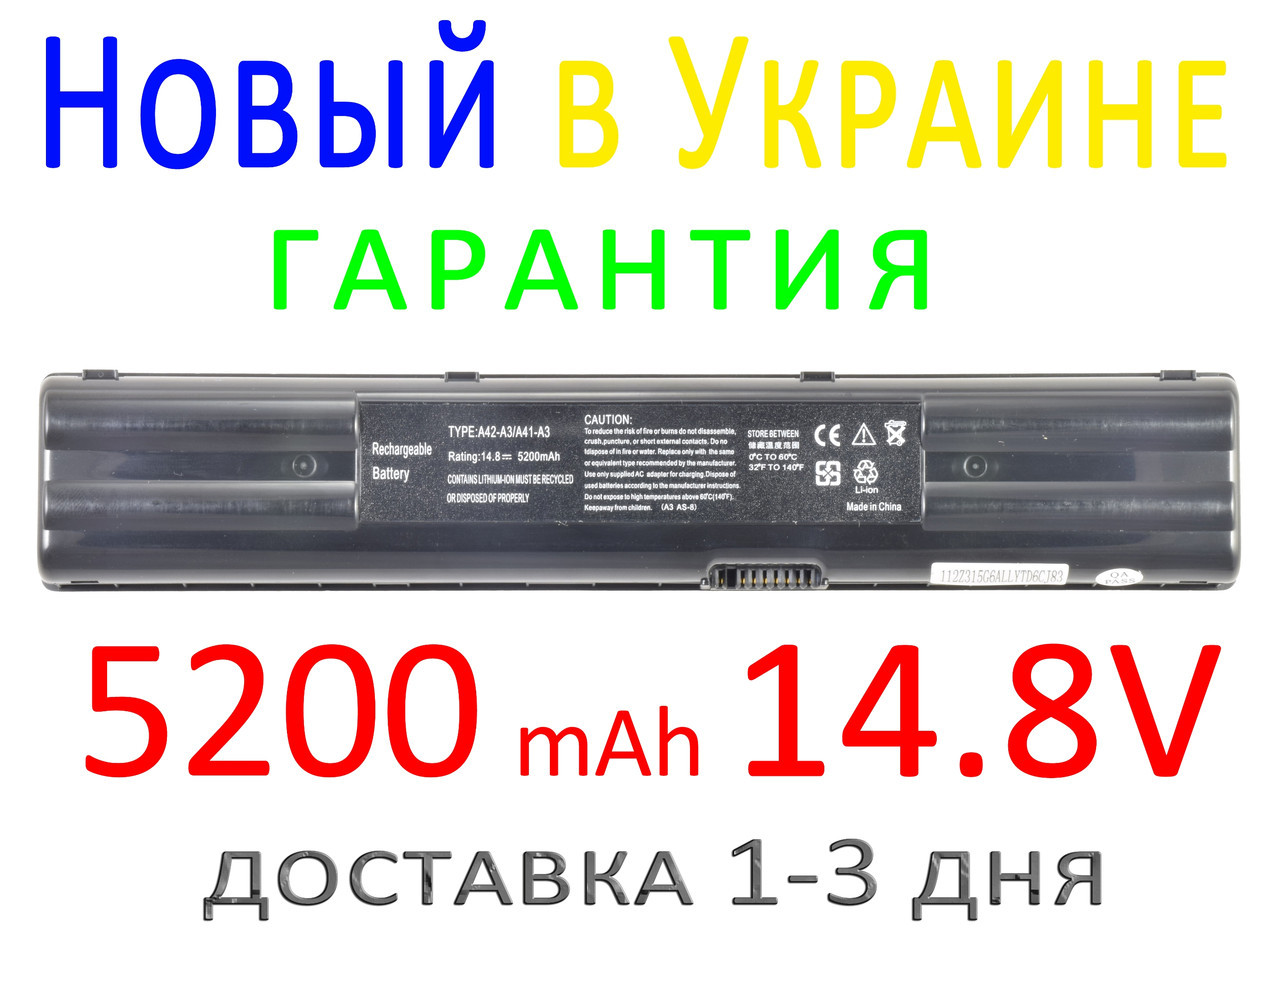 Аккумулятор батарея 70-NFH5B2000M ASUS A42-A3 A3000 A6 A6000 A3 Z91 Z9100 70-NA51B1100